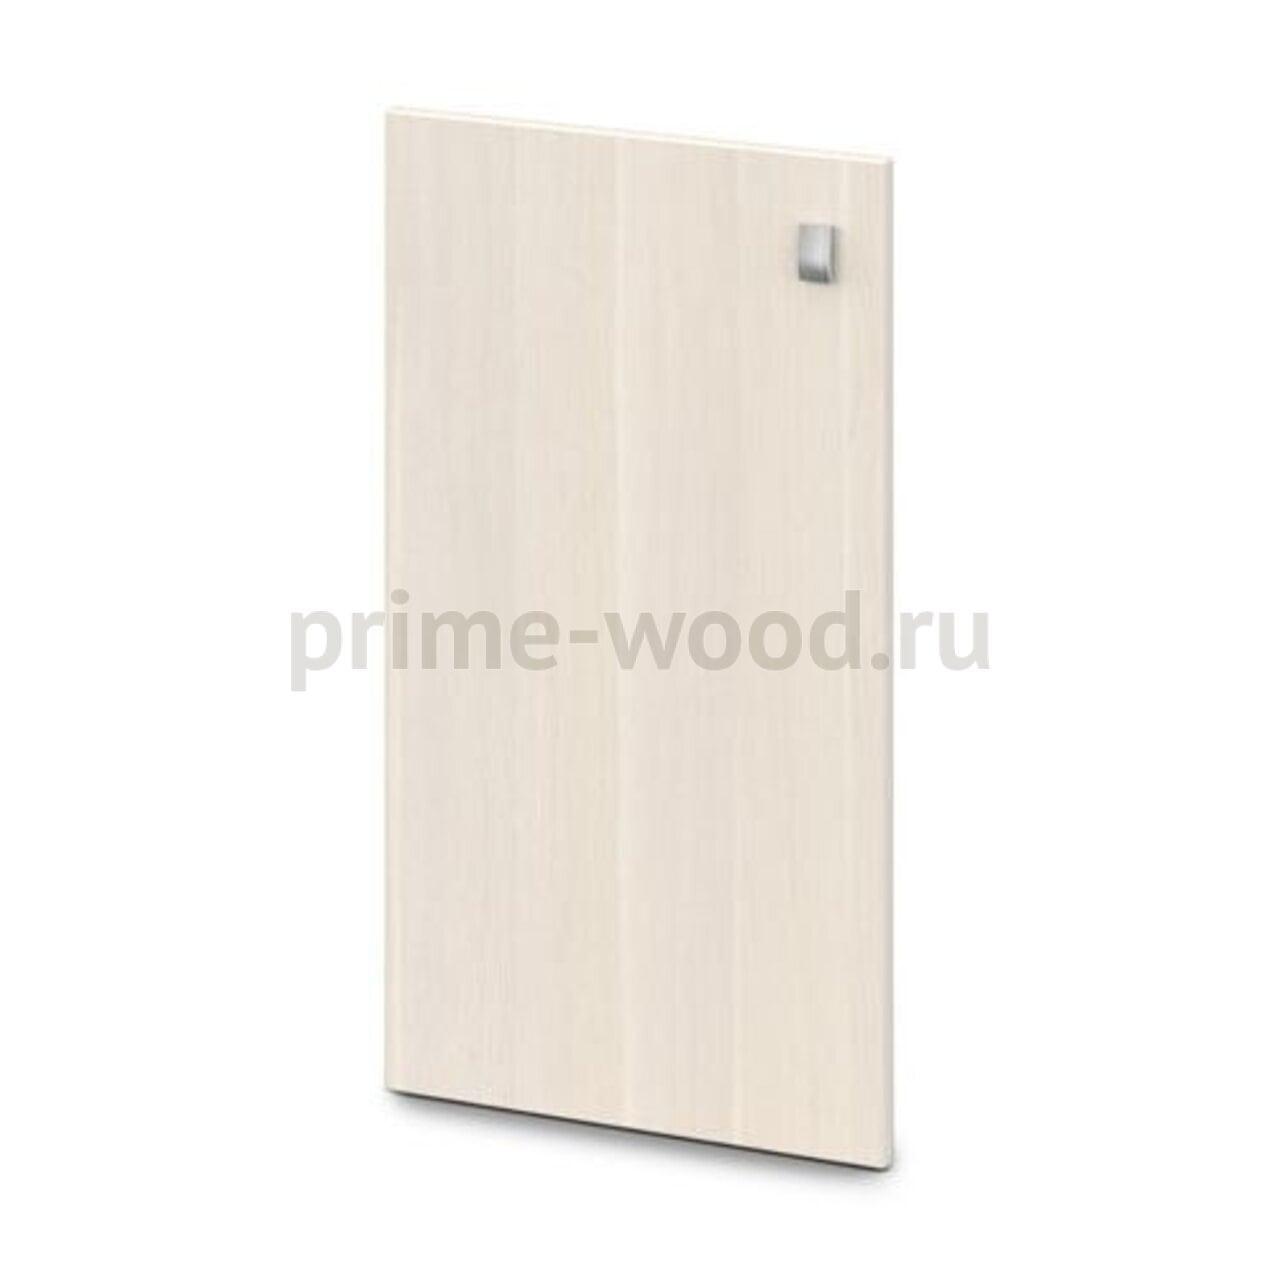 Дверь ЛДСП (левая) Vasanta 41x2x71 - фото 4